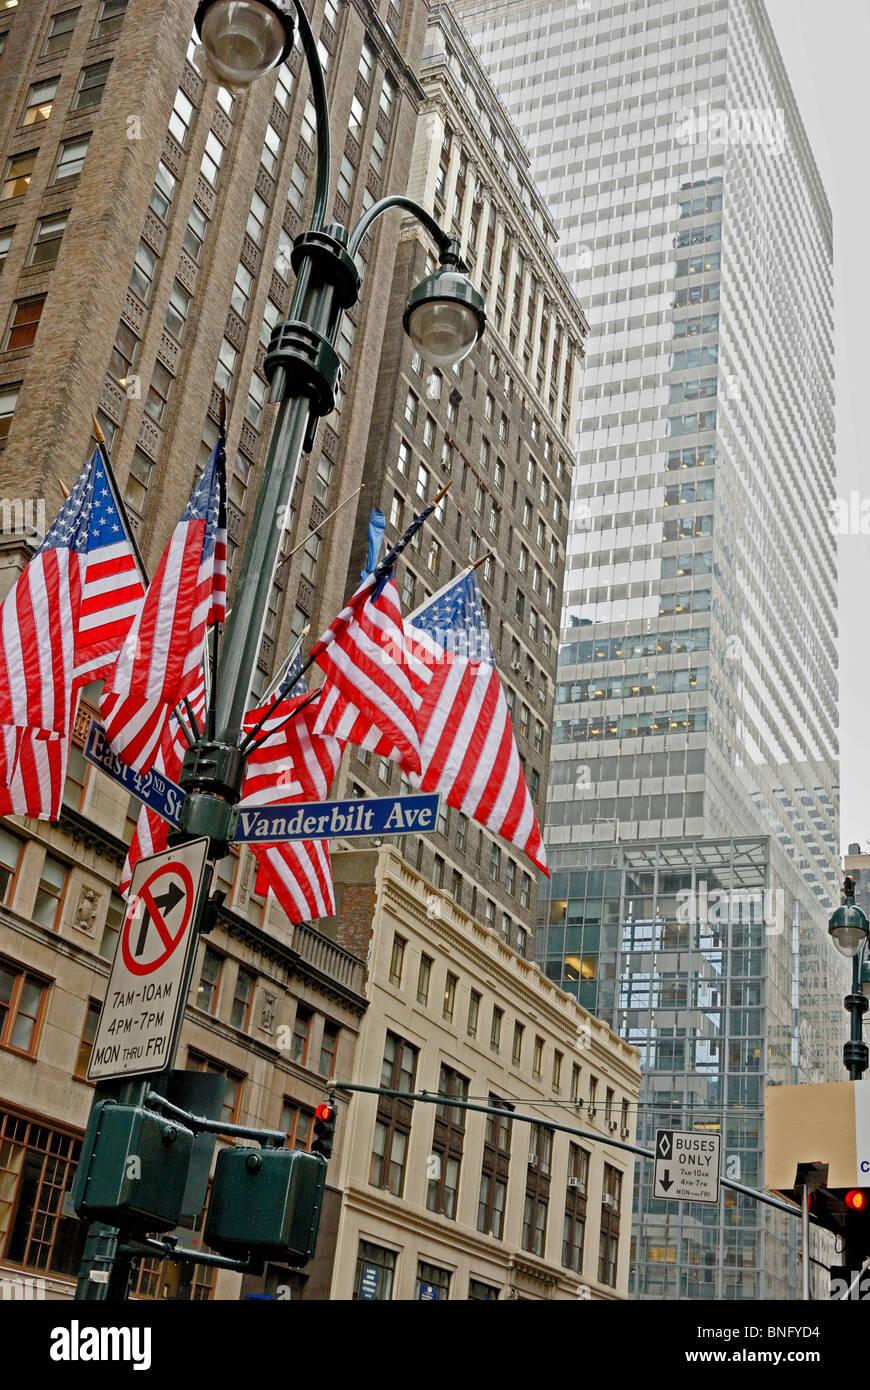 American flags on a street light pole, 42nd Street & Vanderbilt Avenue, Manhattan, New York City, New York state, - Stock Image